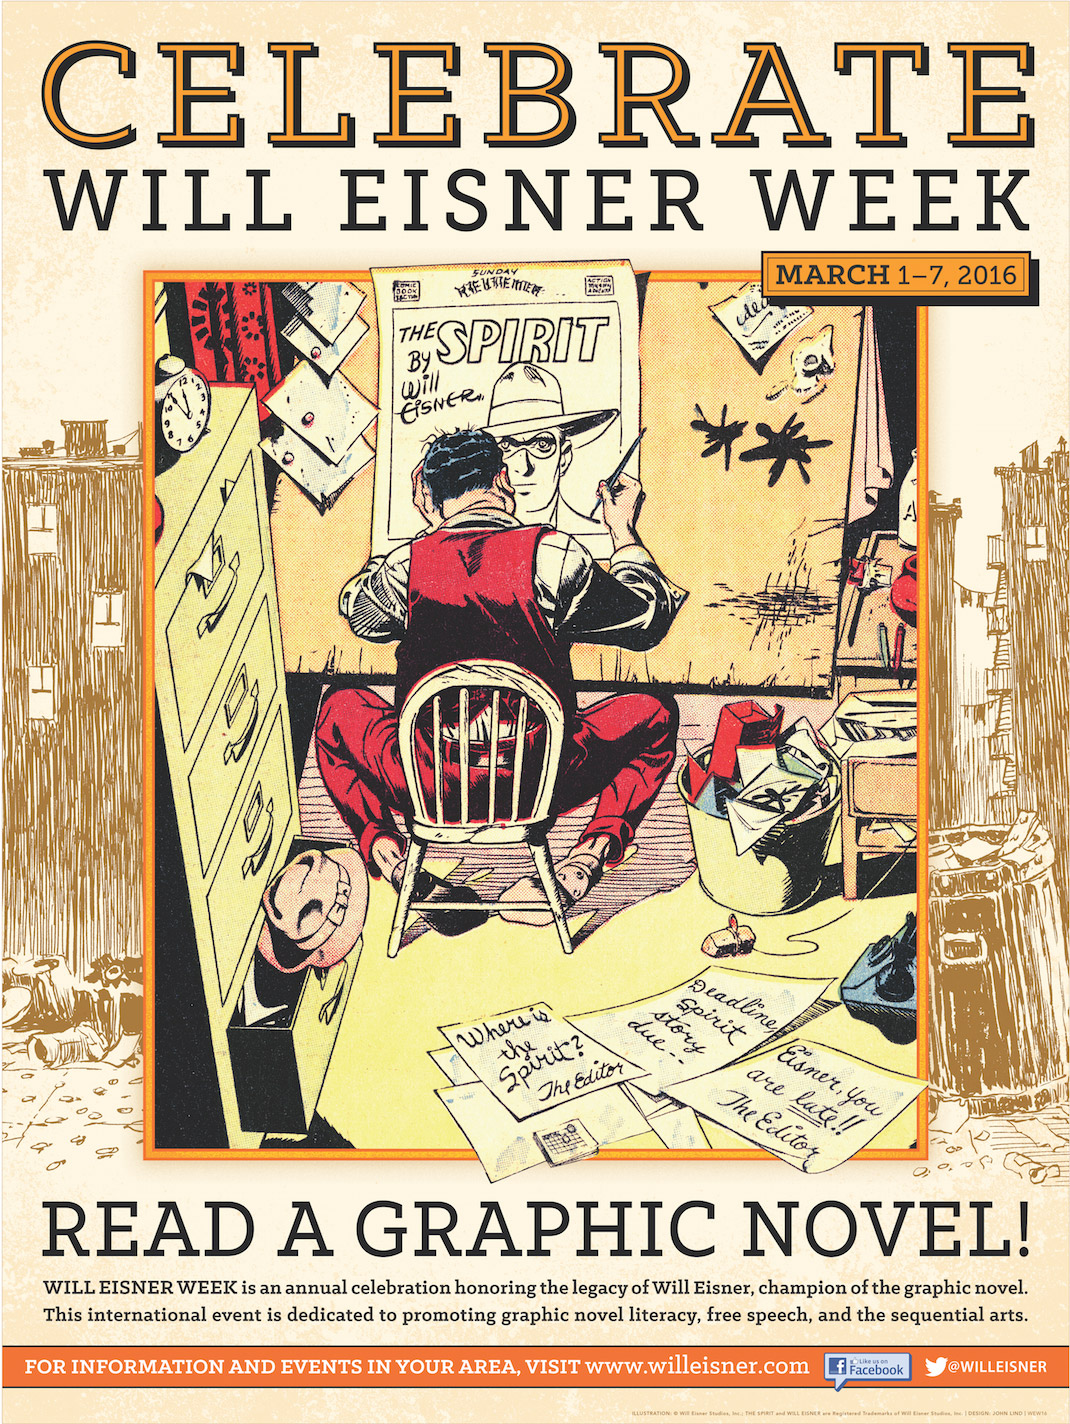 http://www.willeisner.com/will_eisner_week/WESI_WEW2016_Poster.jpg